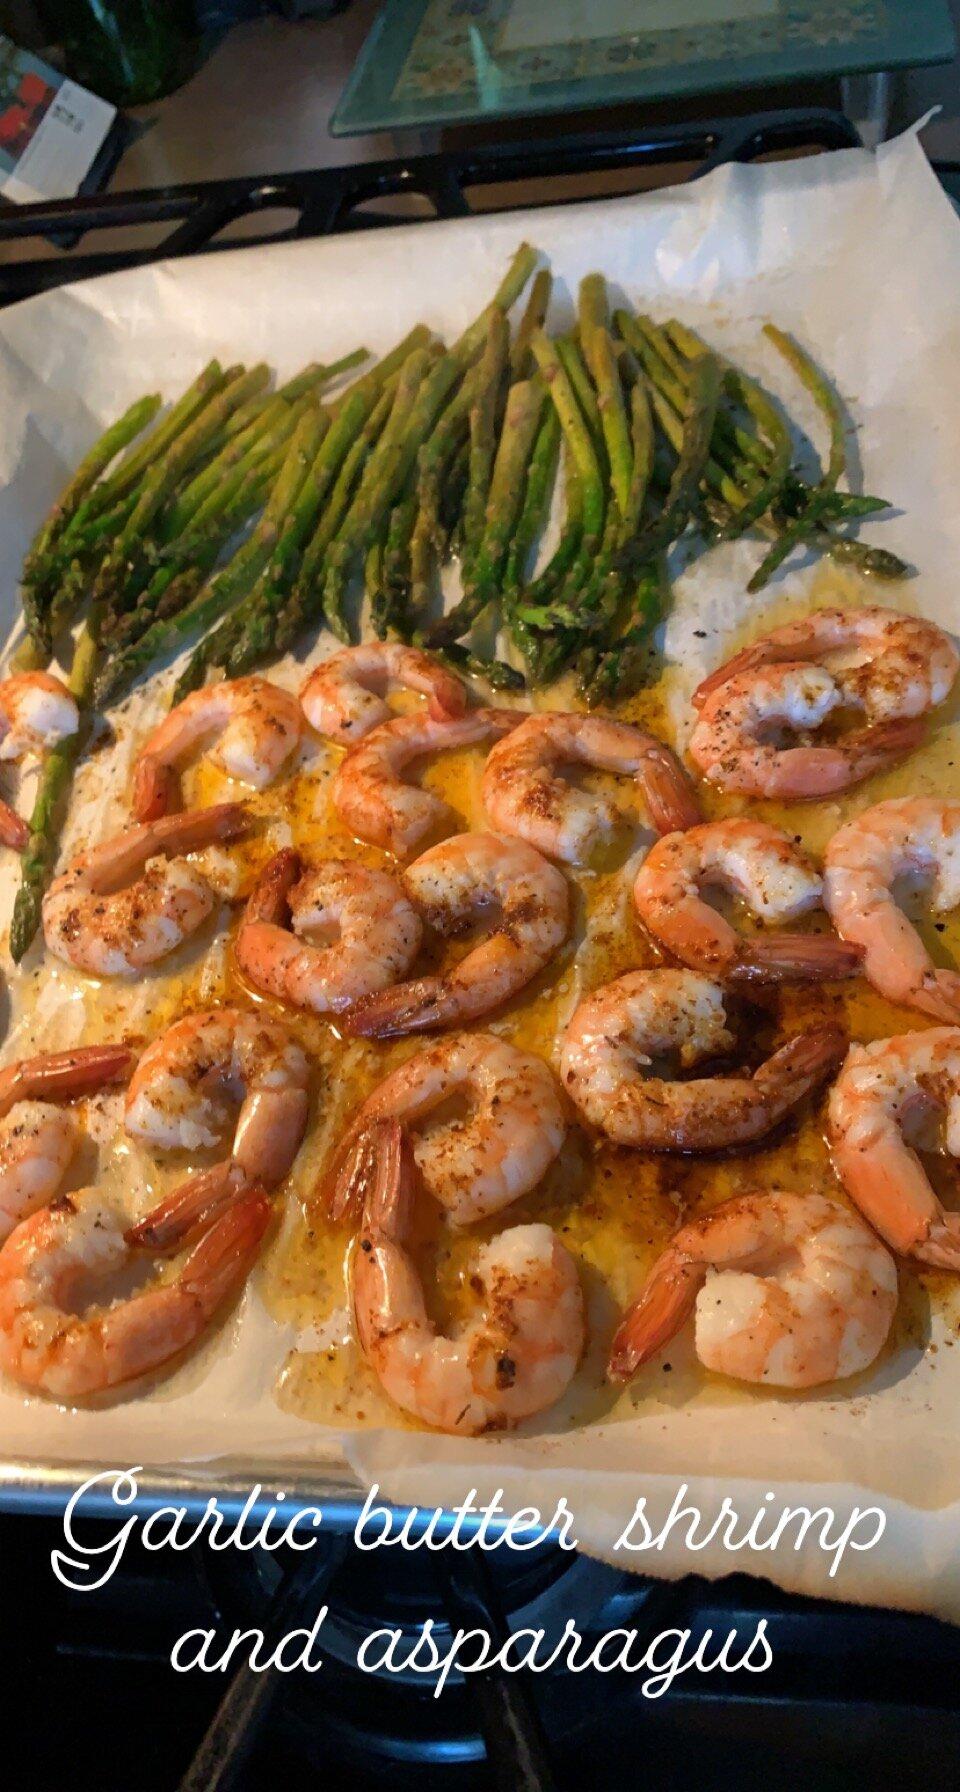 sheet pan lemon butter garlic shrimp with asparagus recipe